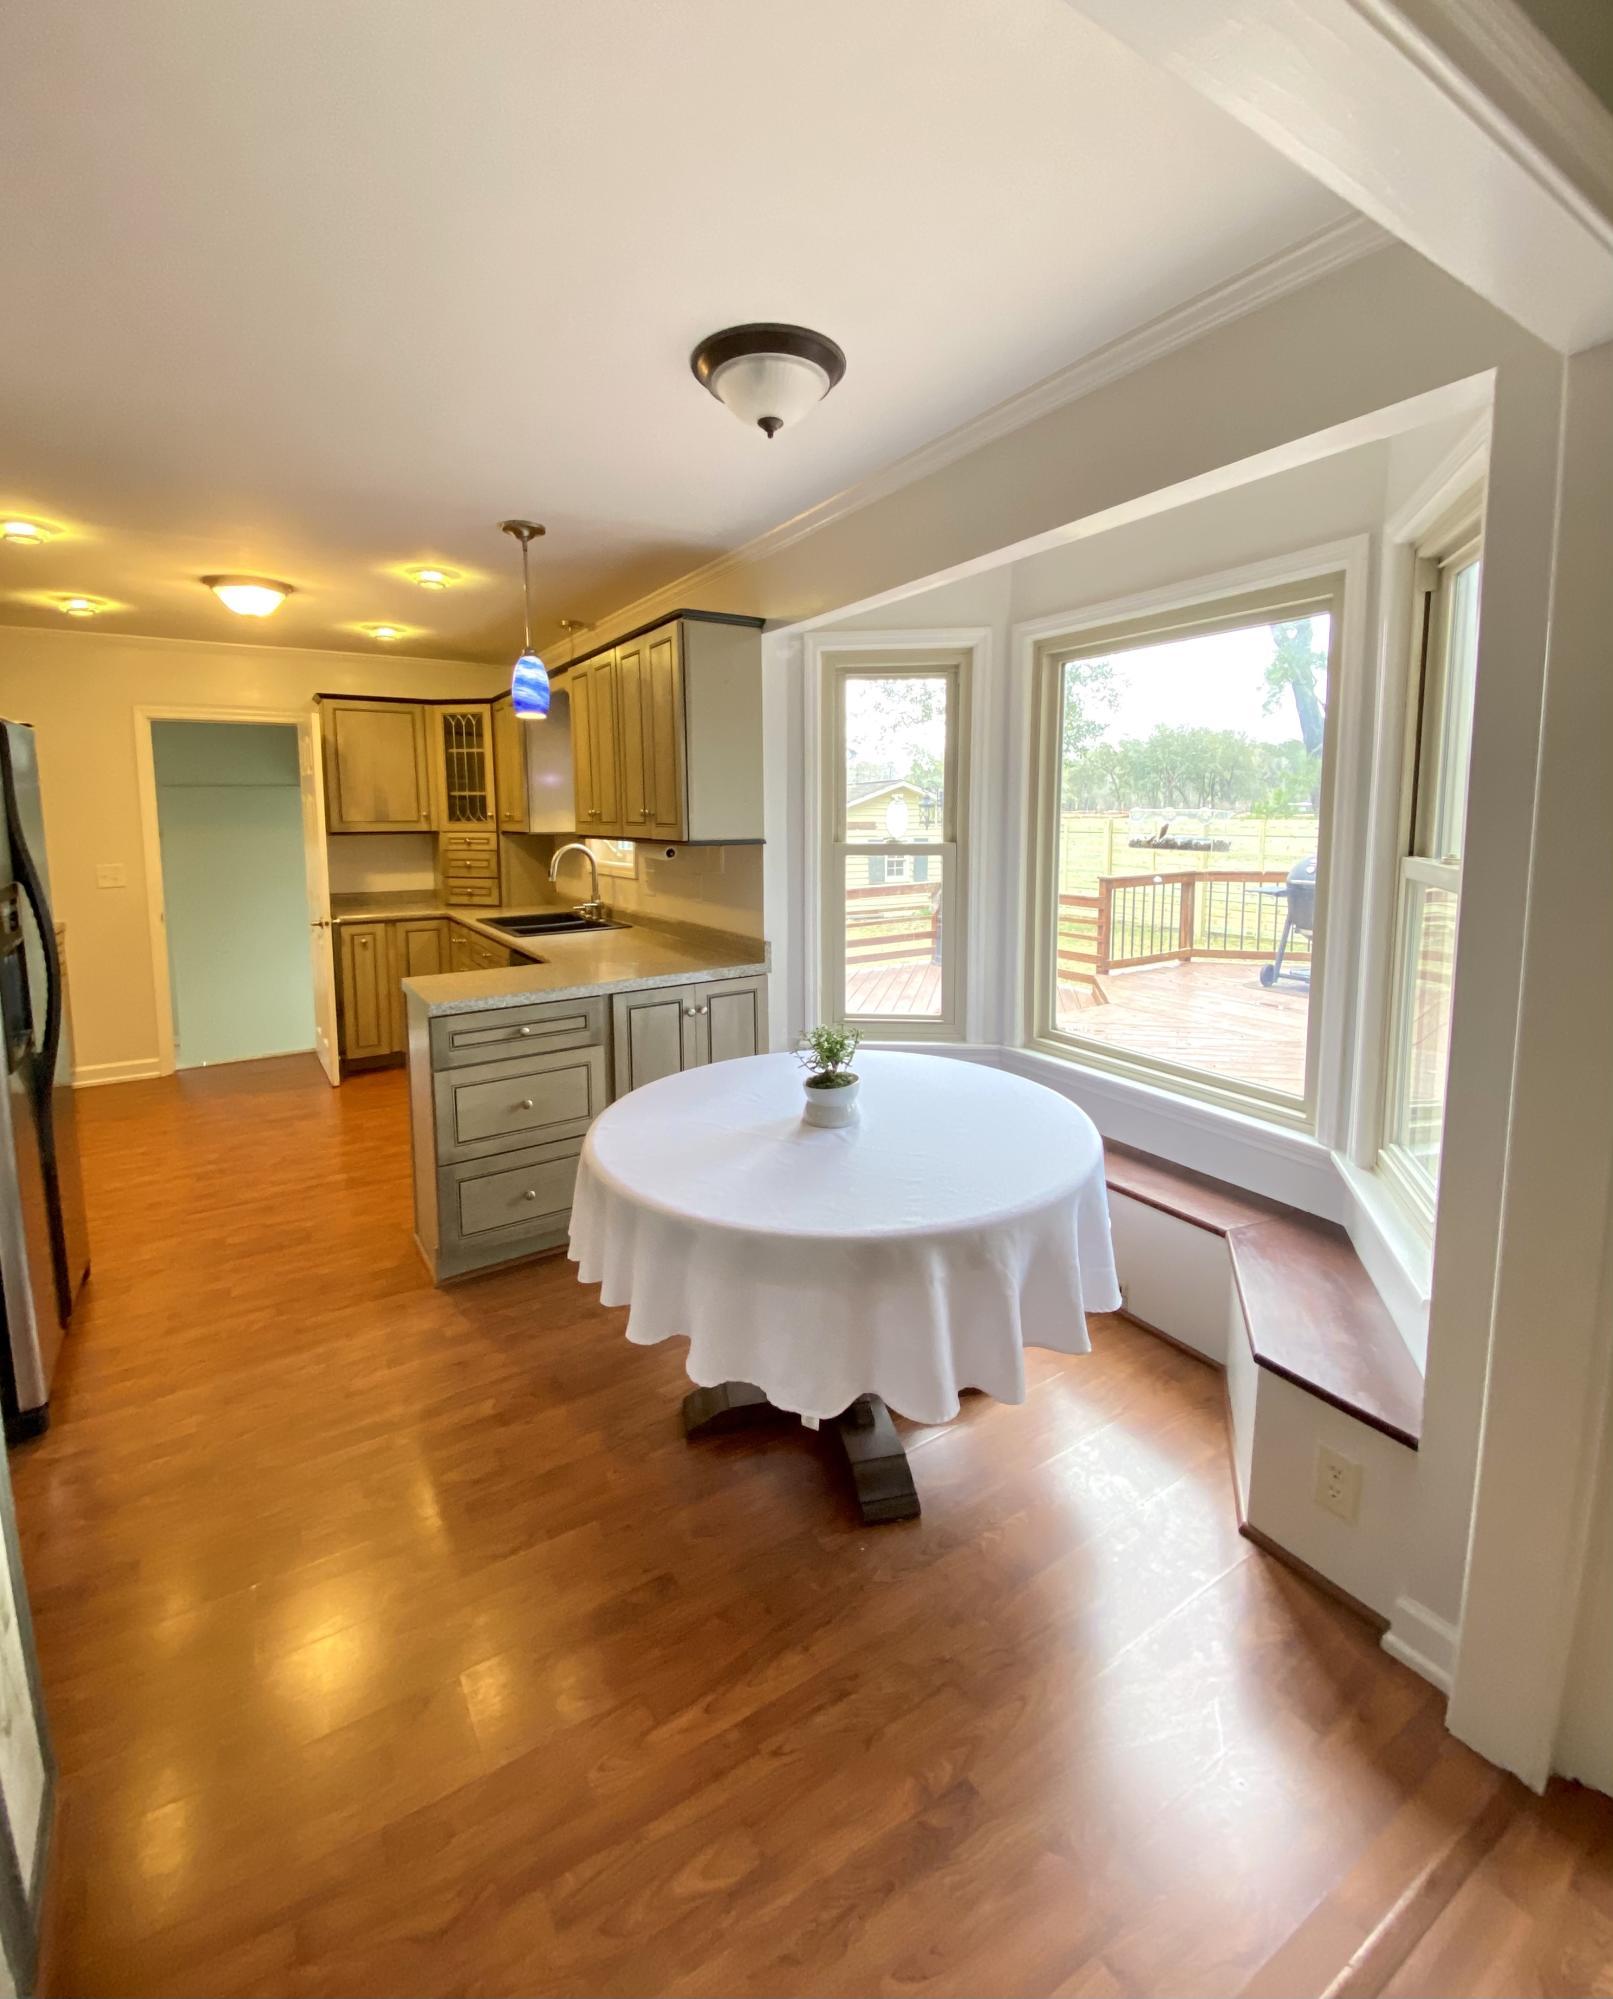 Palmetto Fort Homes For Sale - 1510 Lakeshore, Mount Pleasant, SC - 25